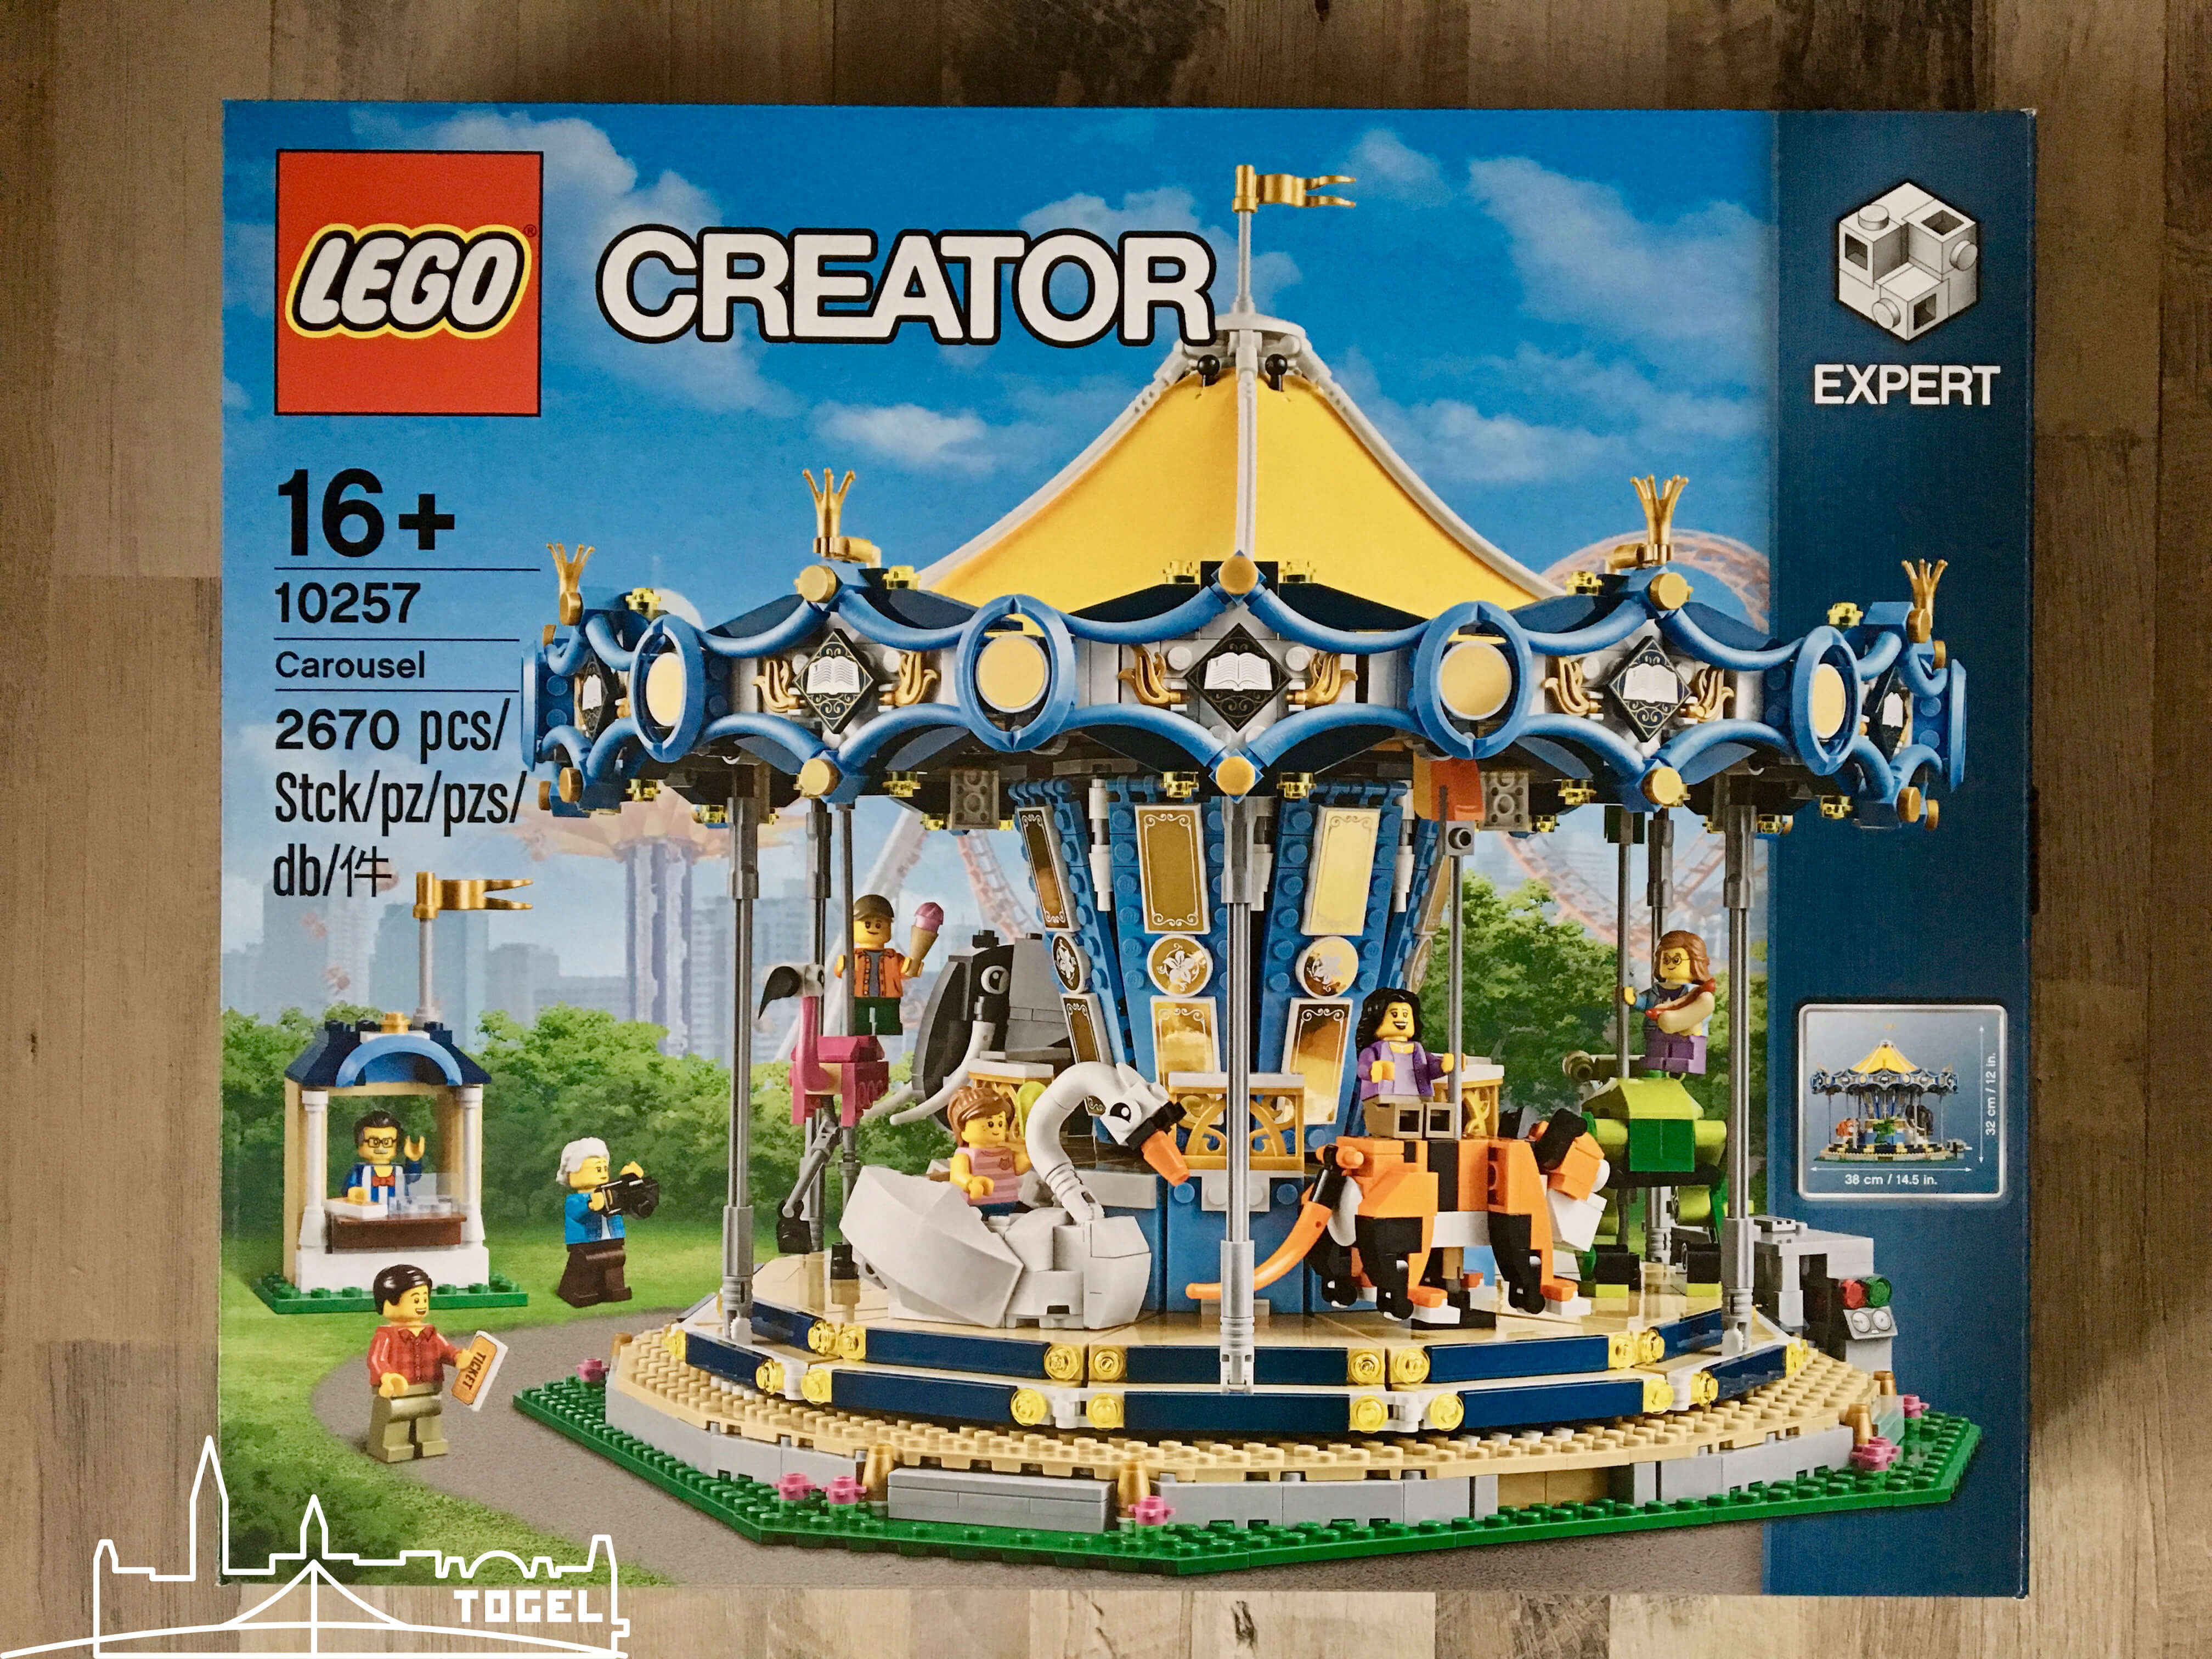 Lego Creator Karussell Carousel 10257 zählt zu den 5 besten Lego Sets 2017